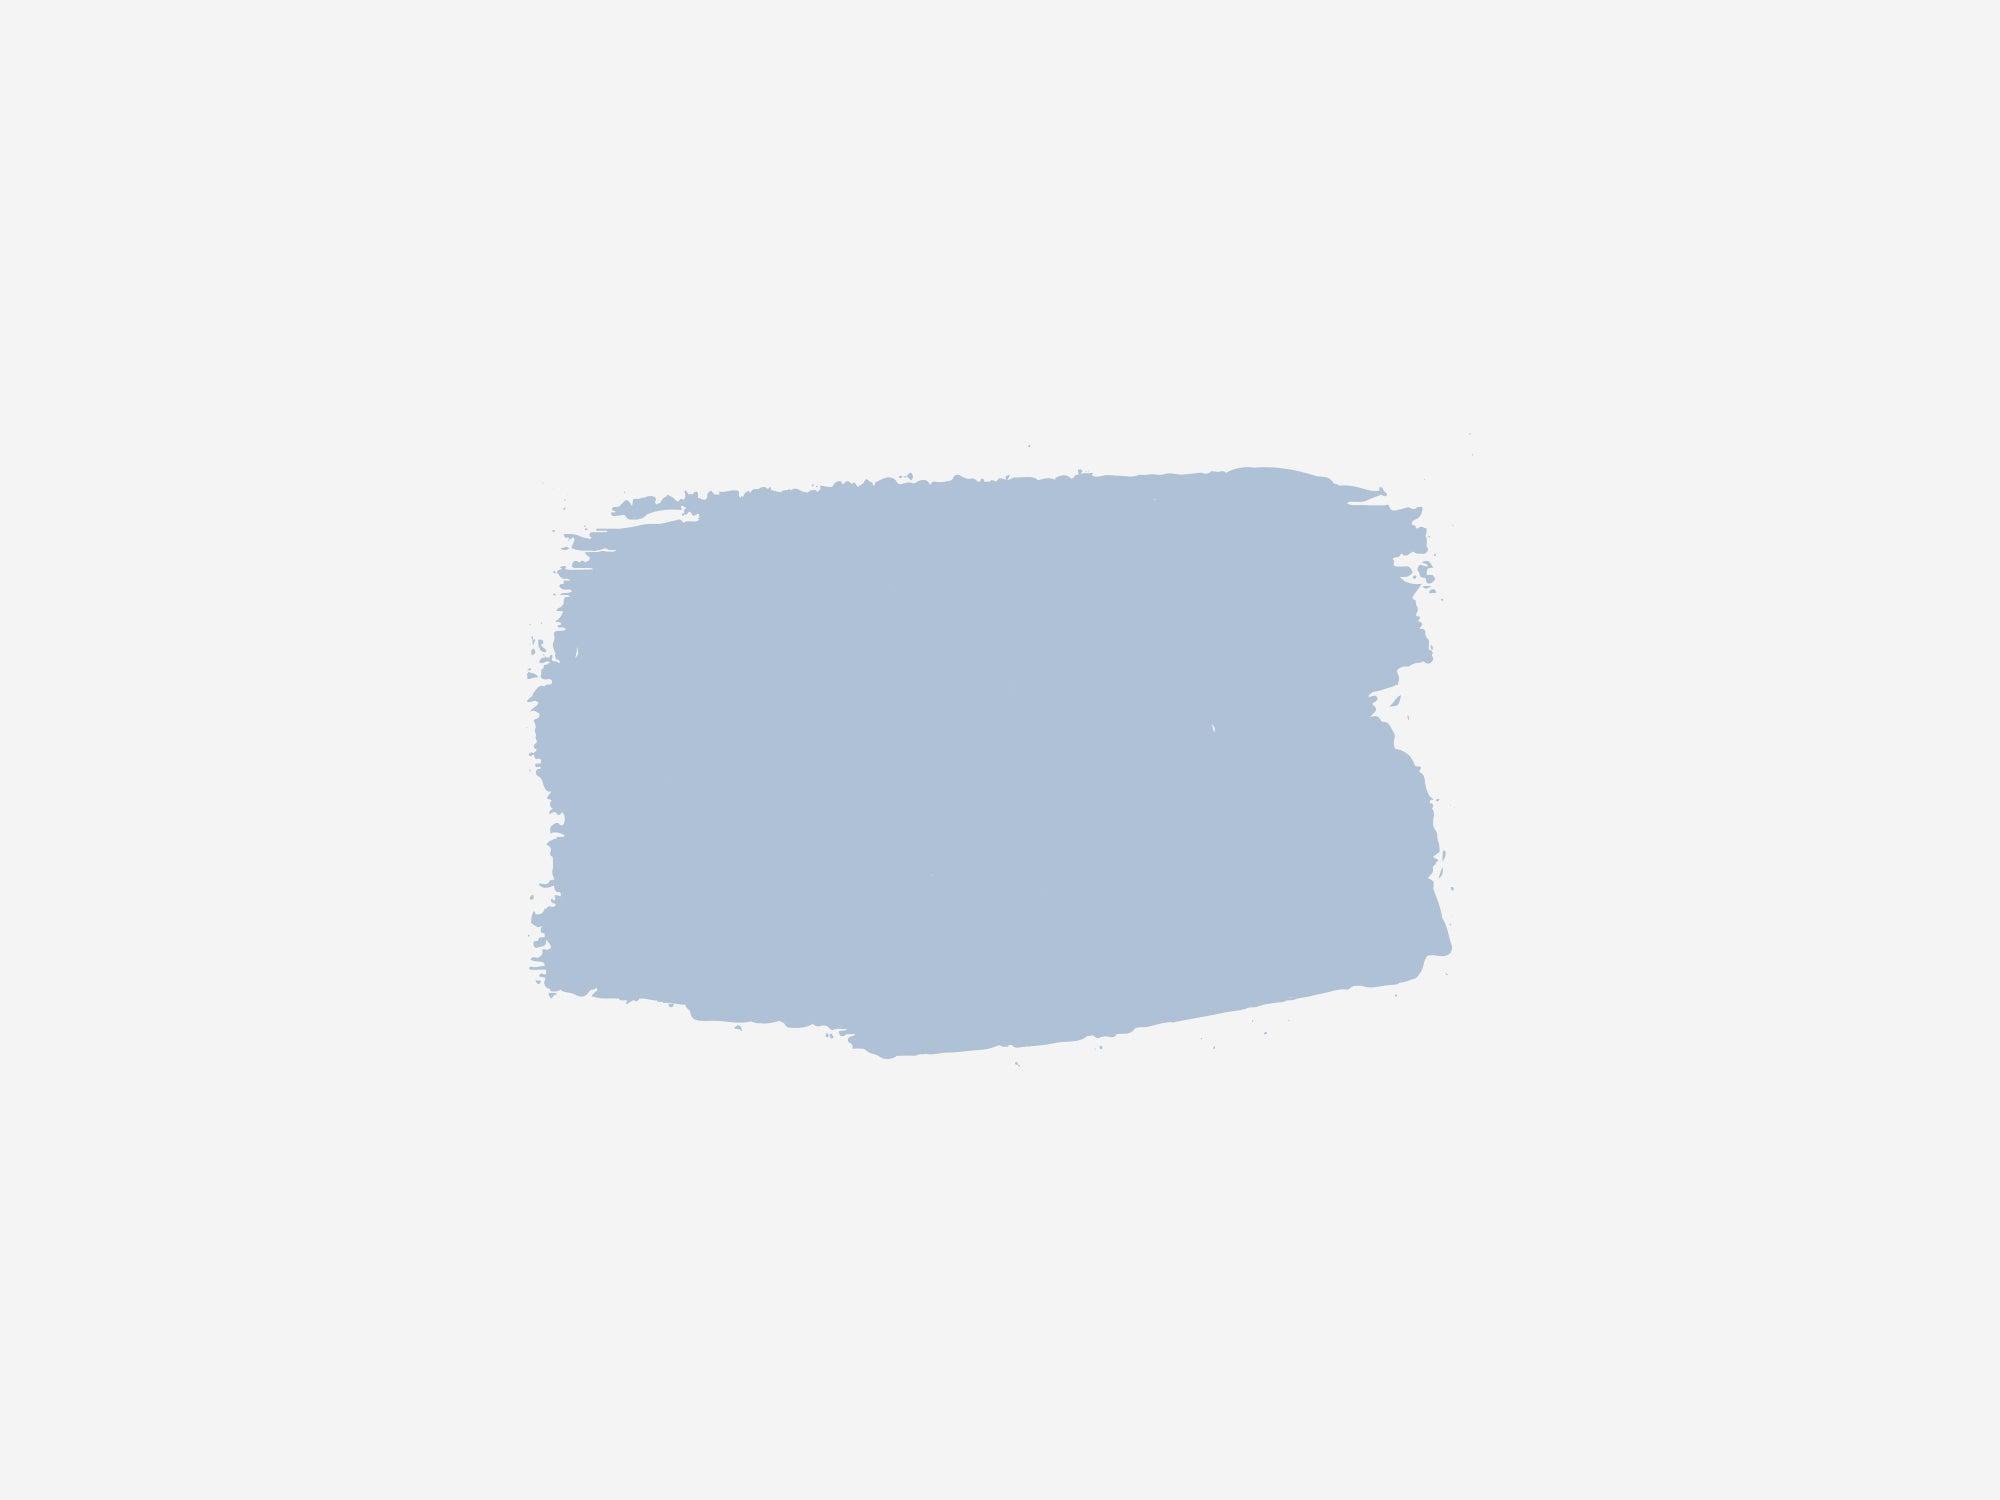 dunn_edwards_prim_blue